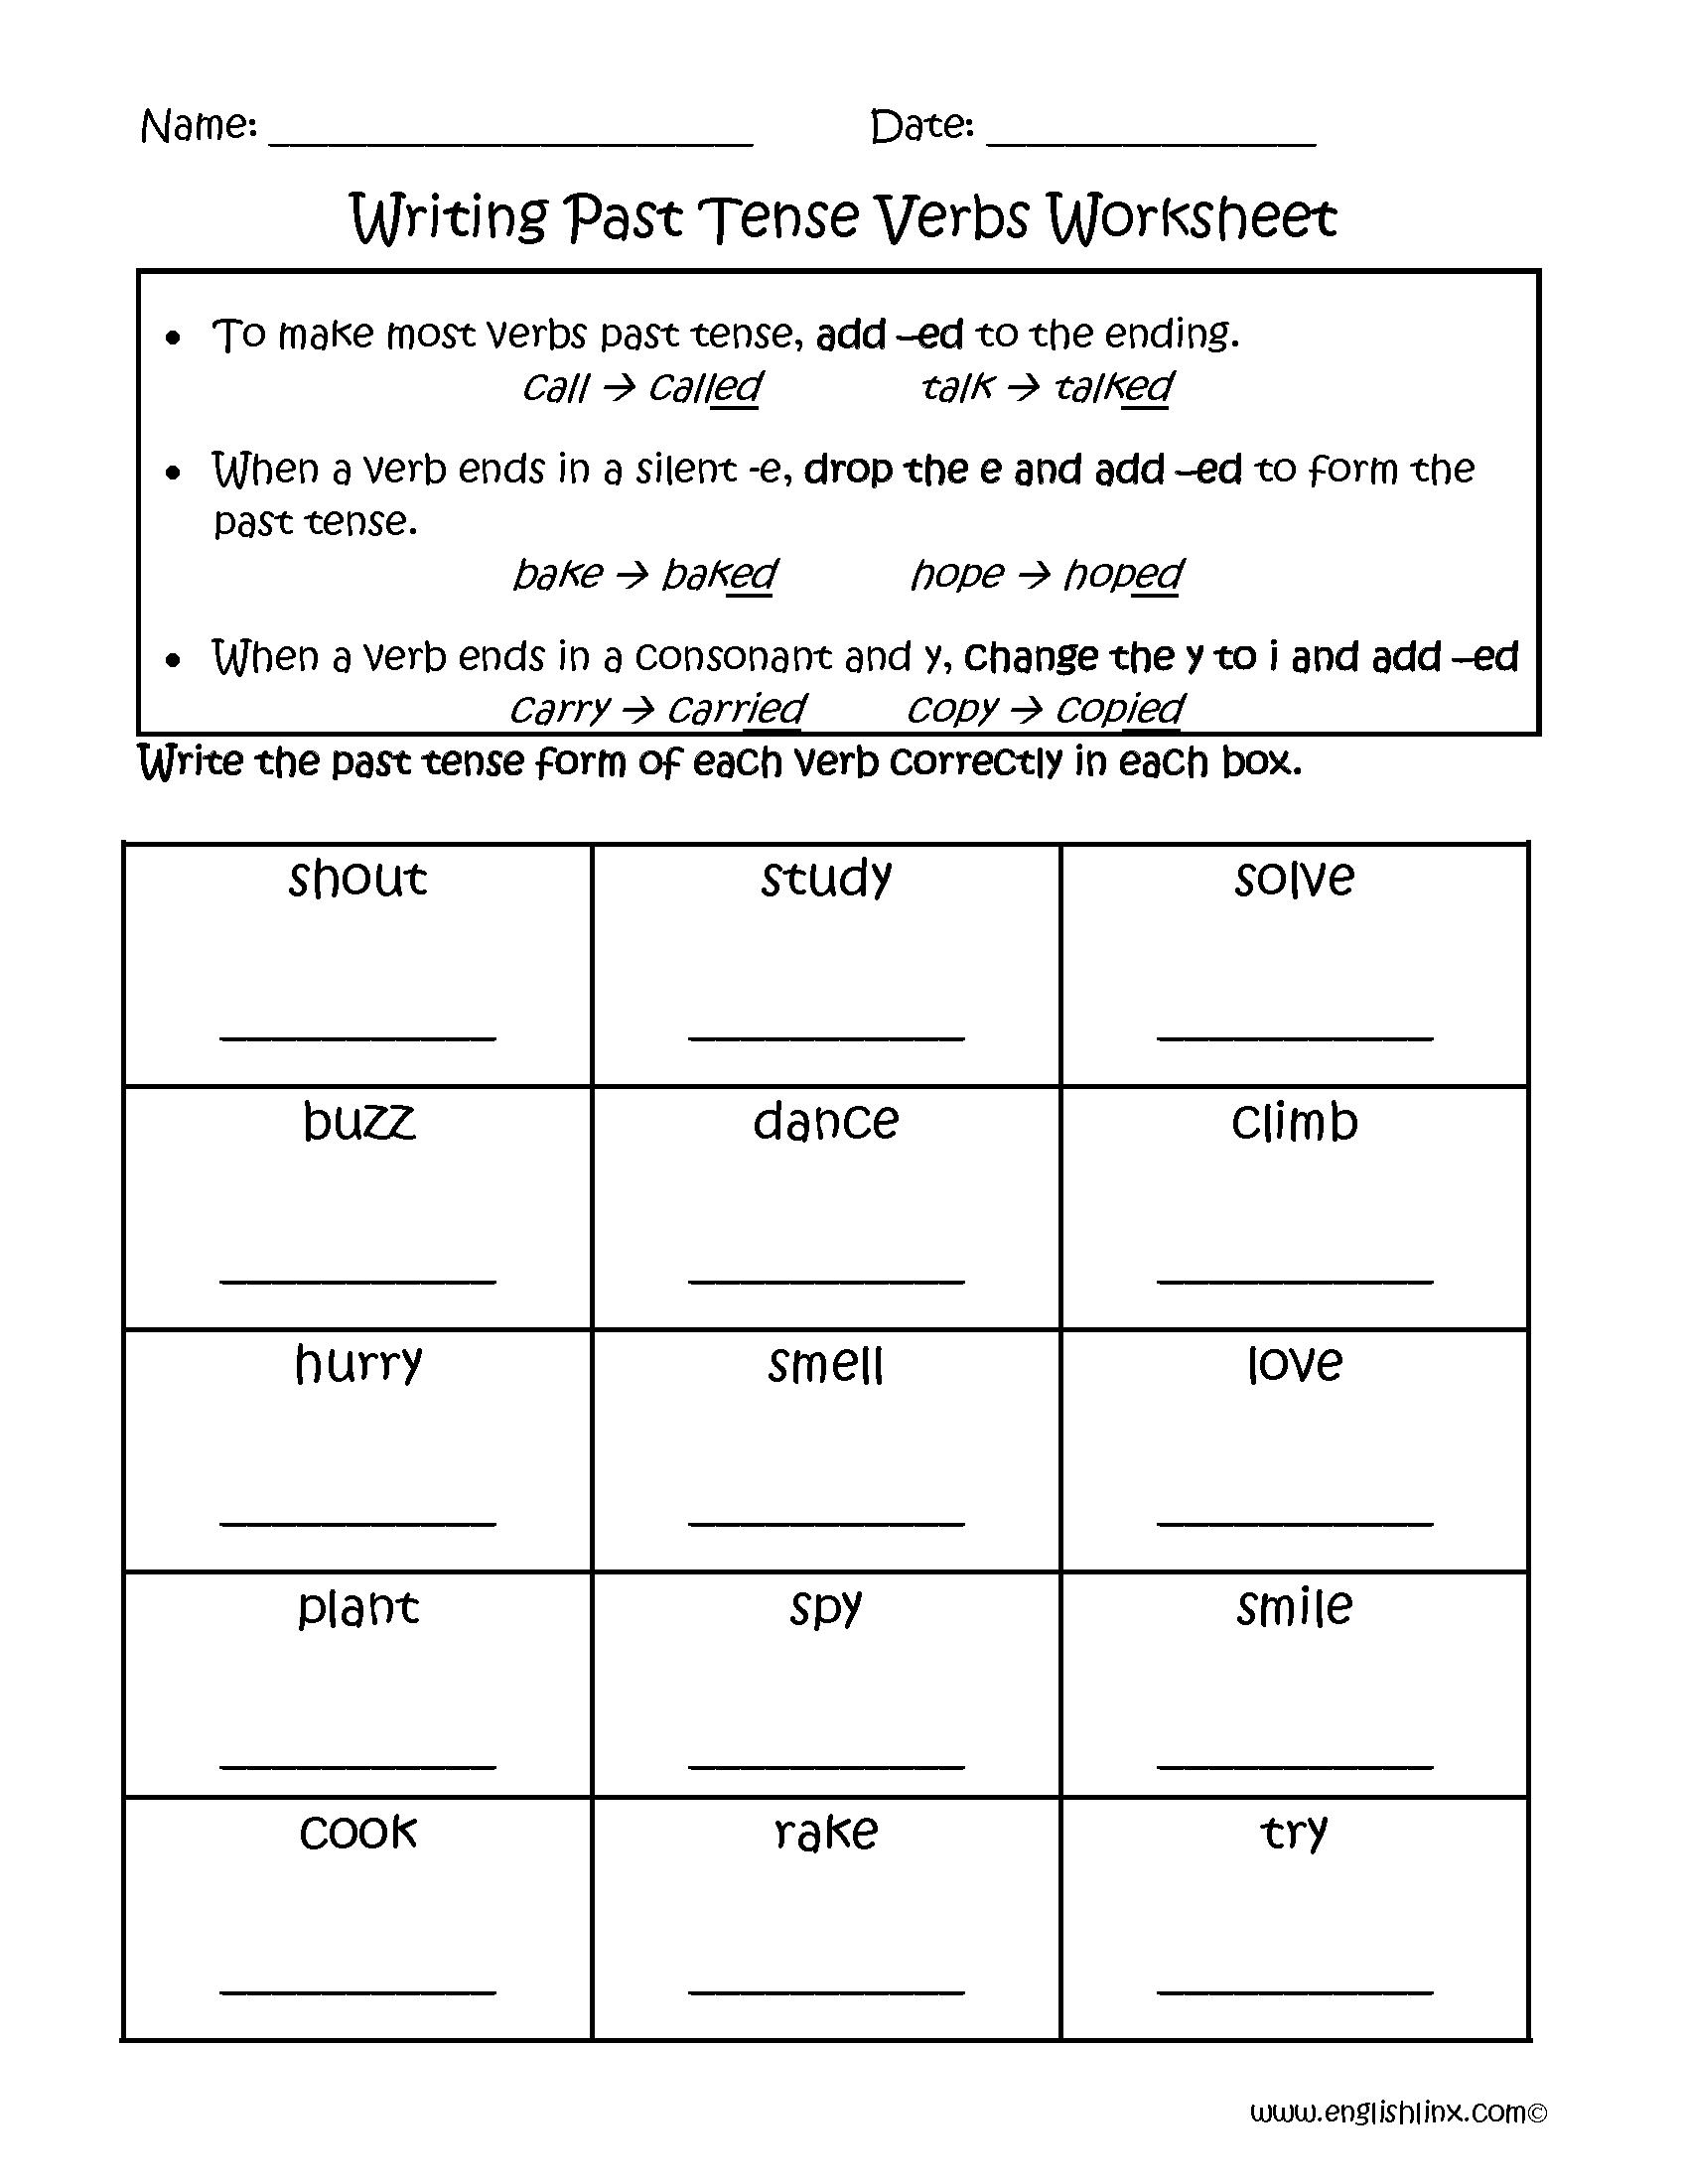 Past Tense Verb Worksheets 578138